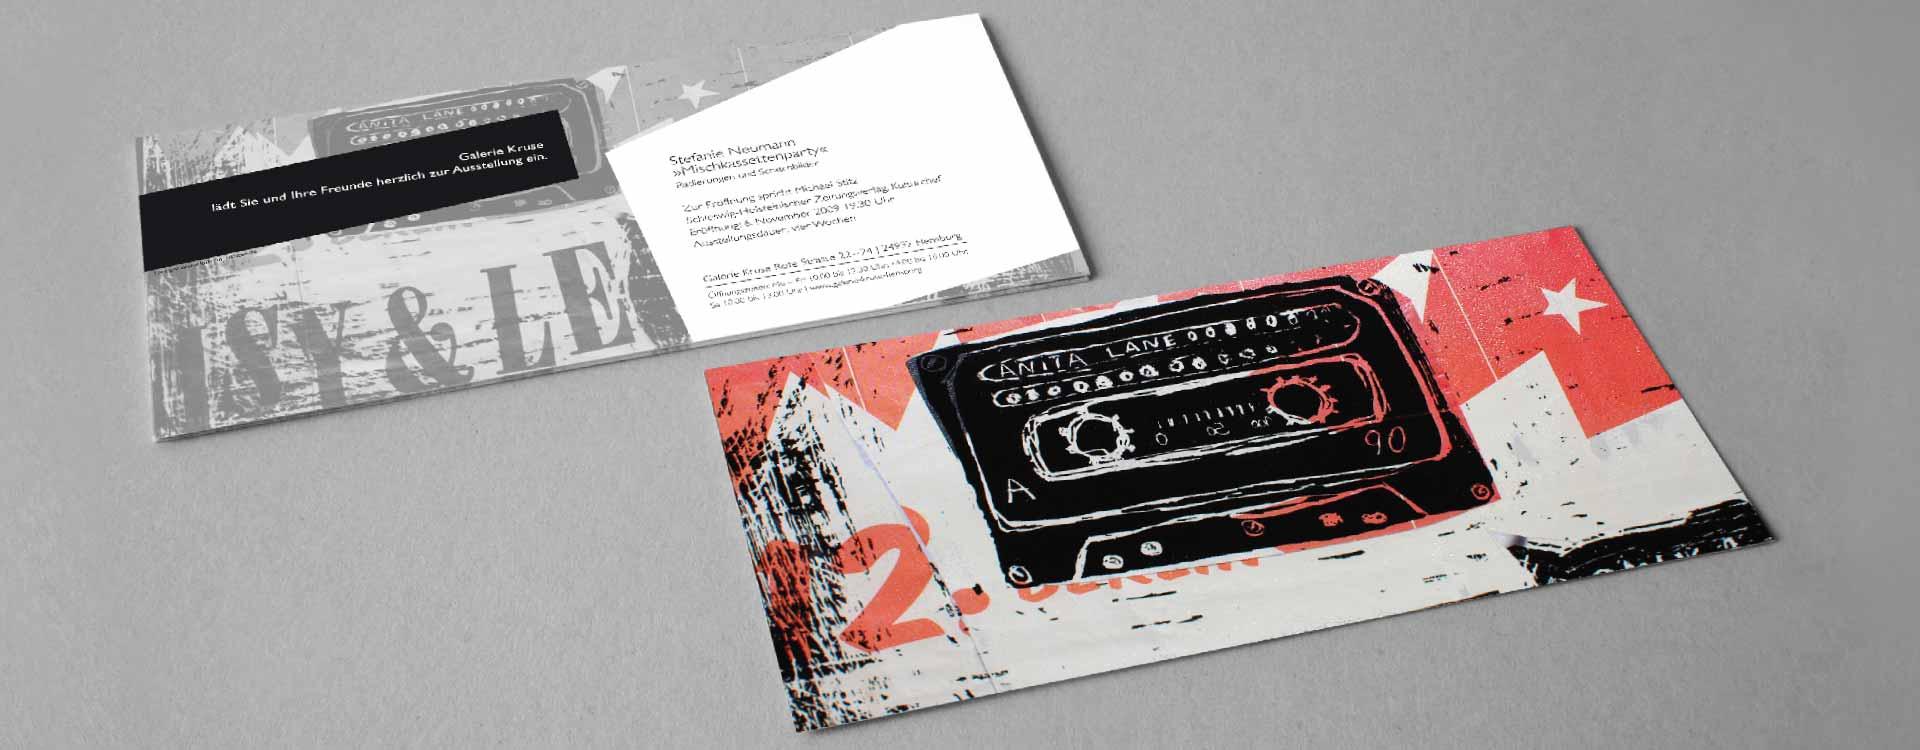 Invitation card for the solo exhibition of Stefanie Neumann in the Galerie Kruse, Flensburg; Design: Kattrin Richter   Graphic Design Studio